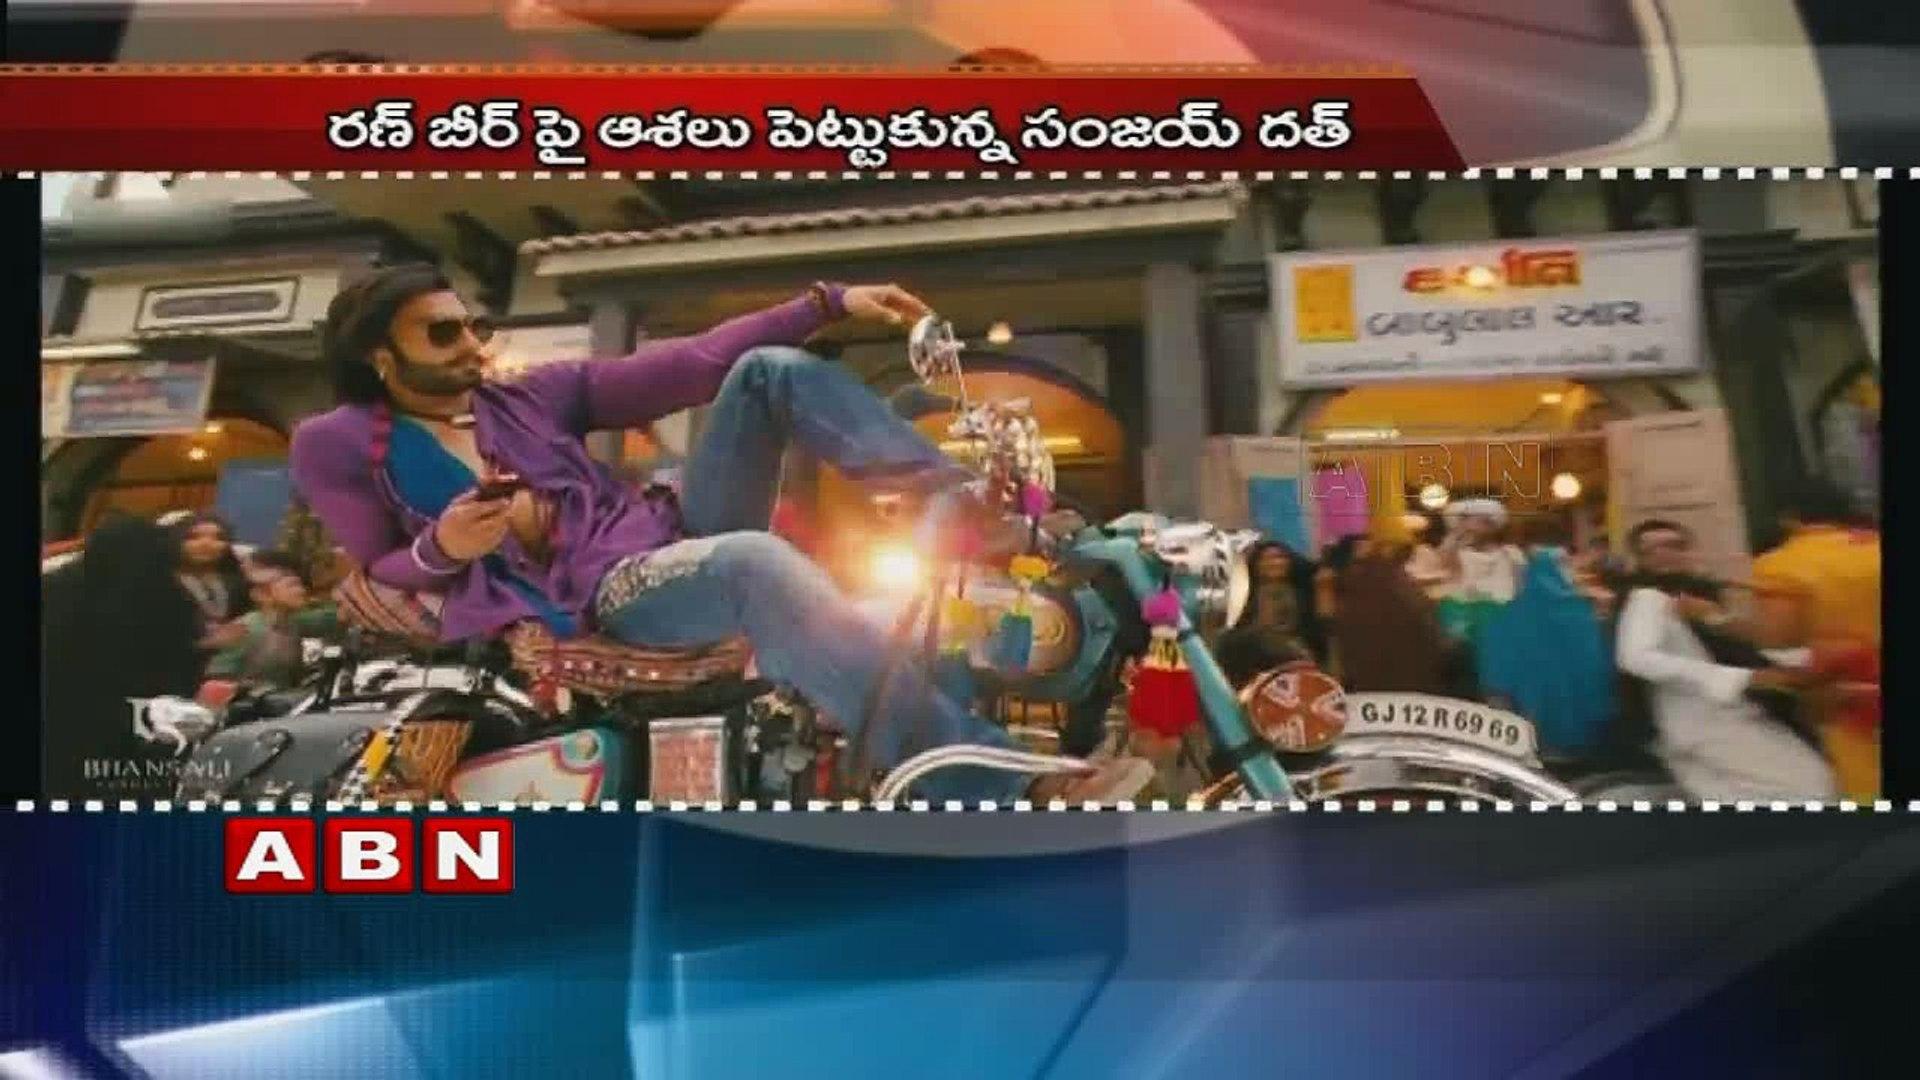 Sanjay Dutt to reprise 'Ballu Balram' in 'Khalnayak Returns'